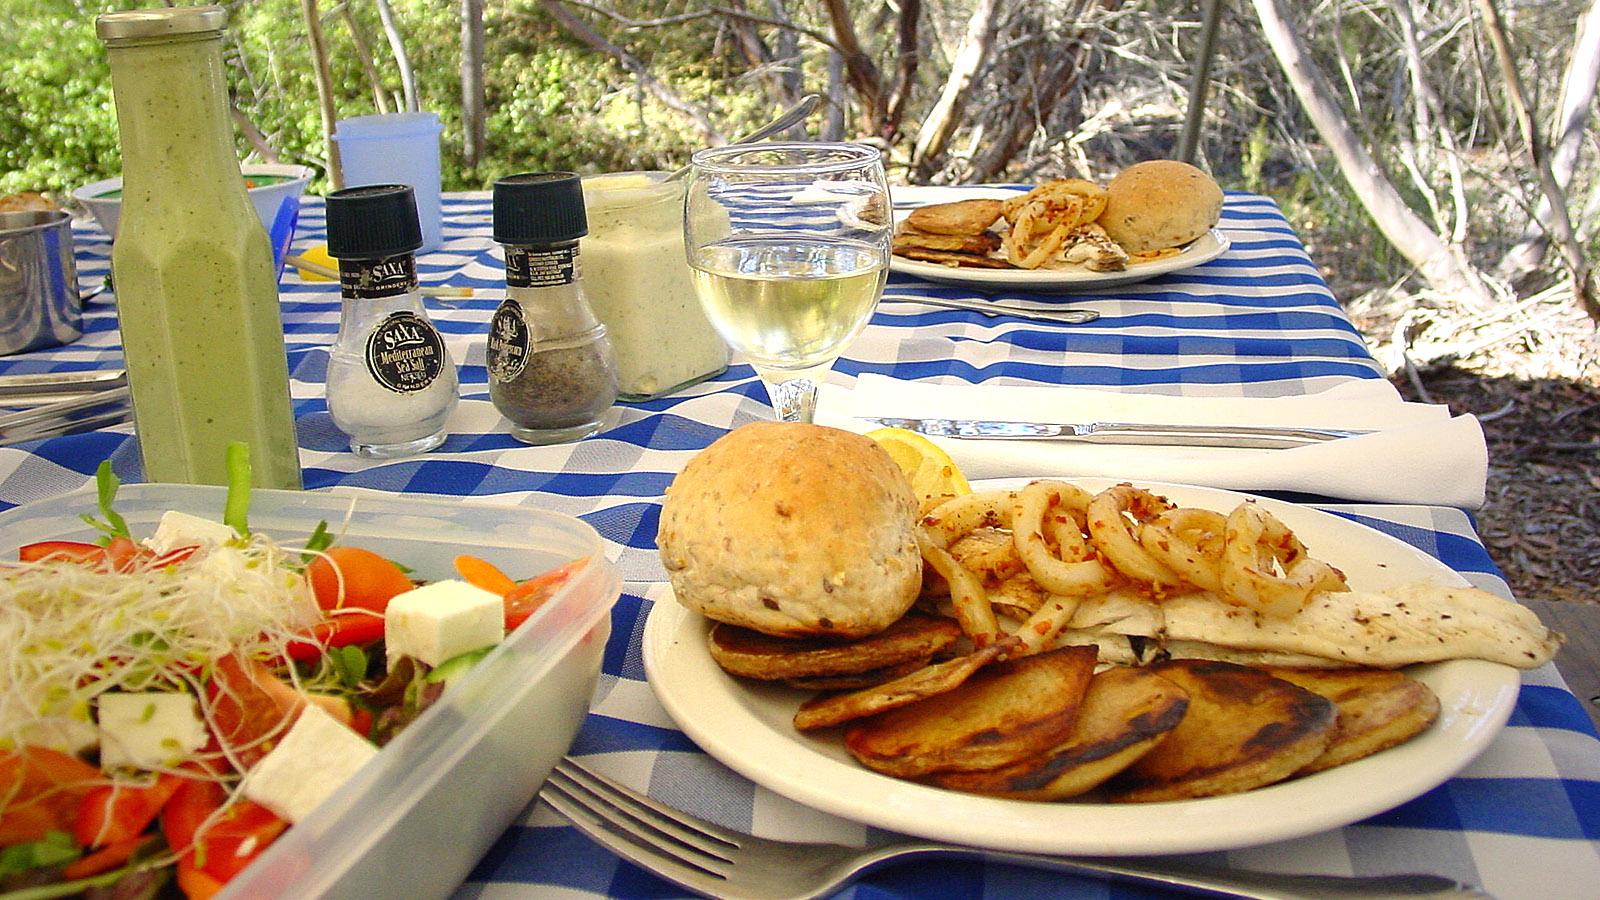 Leckeres Lunch mitte im Bush – auf Kangaroo Island in Südaustralien. Foto: Hilke Maunder